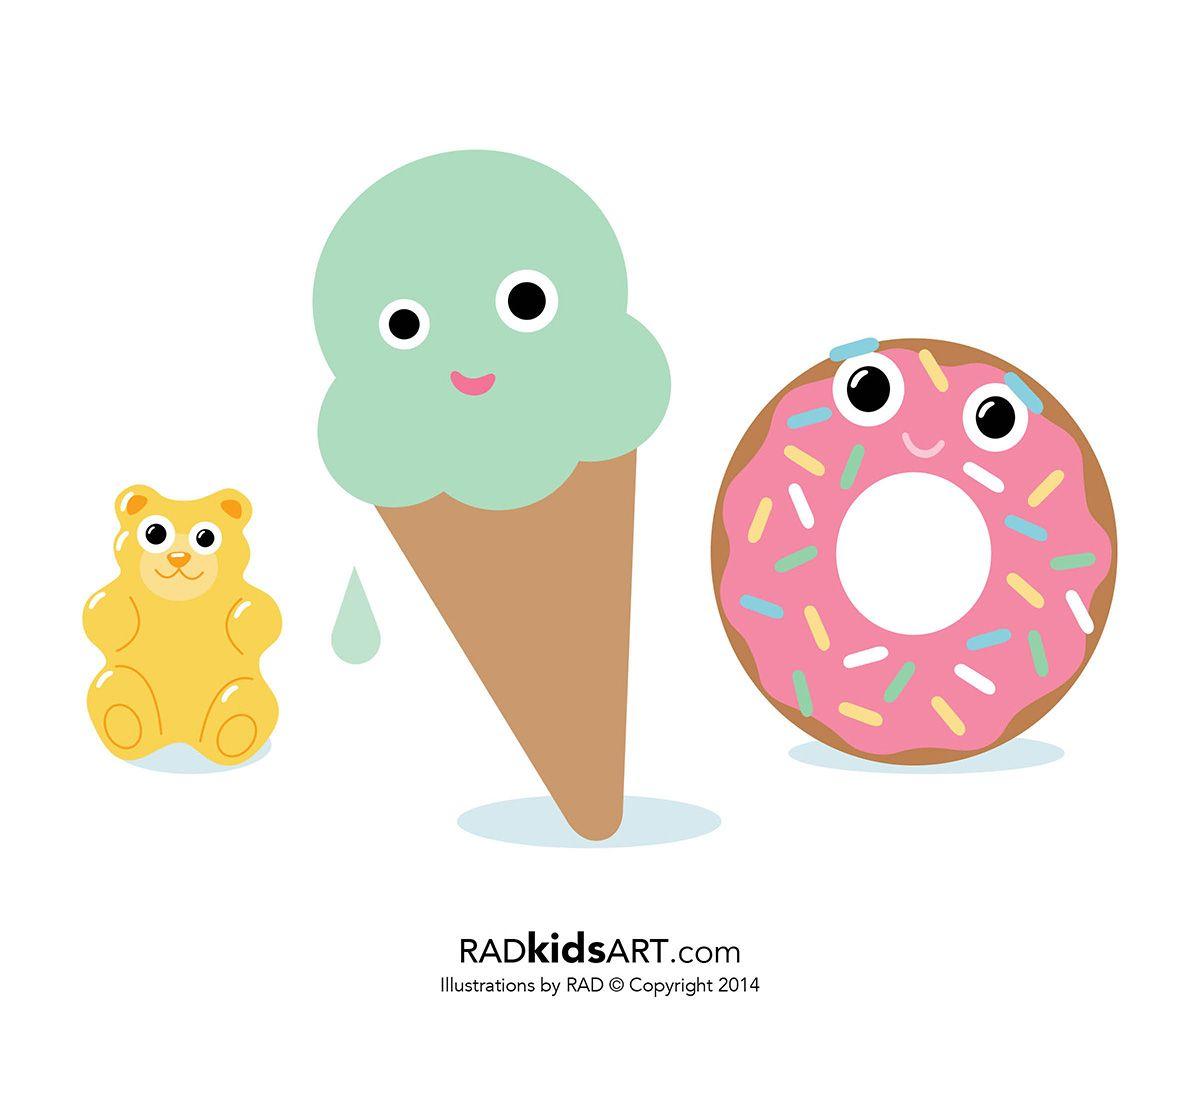 Gummi Bear Ice Cream Donut Radkidsart